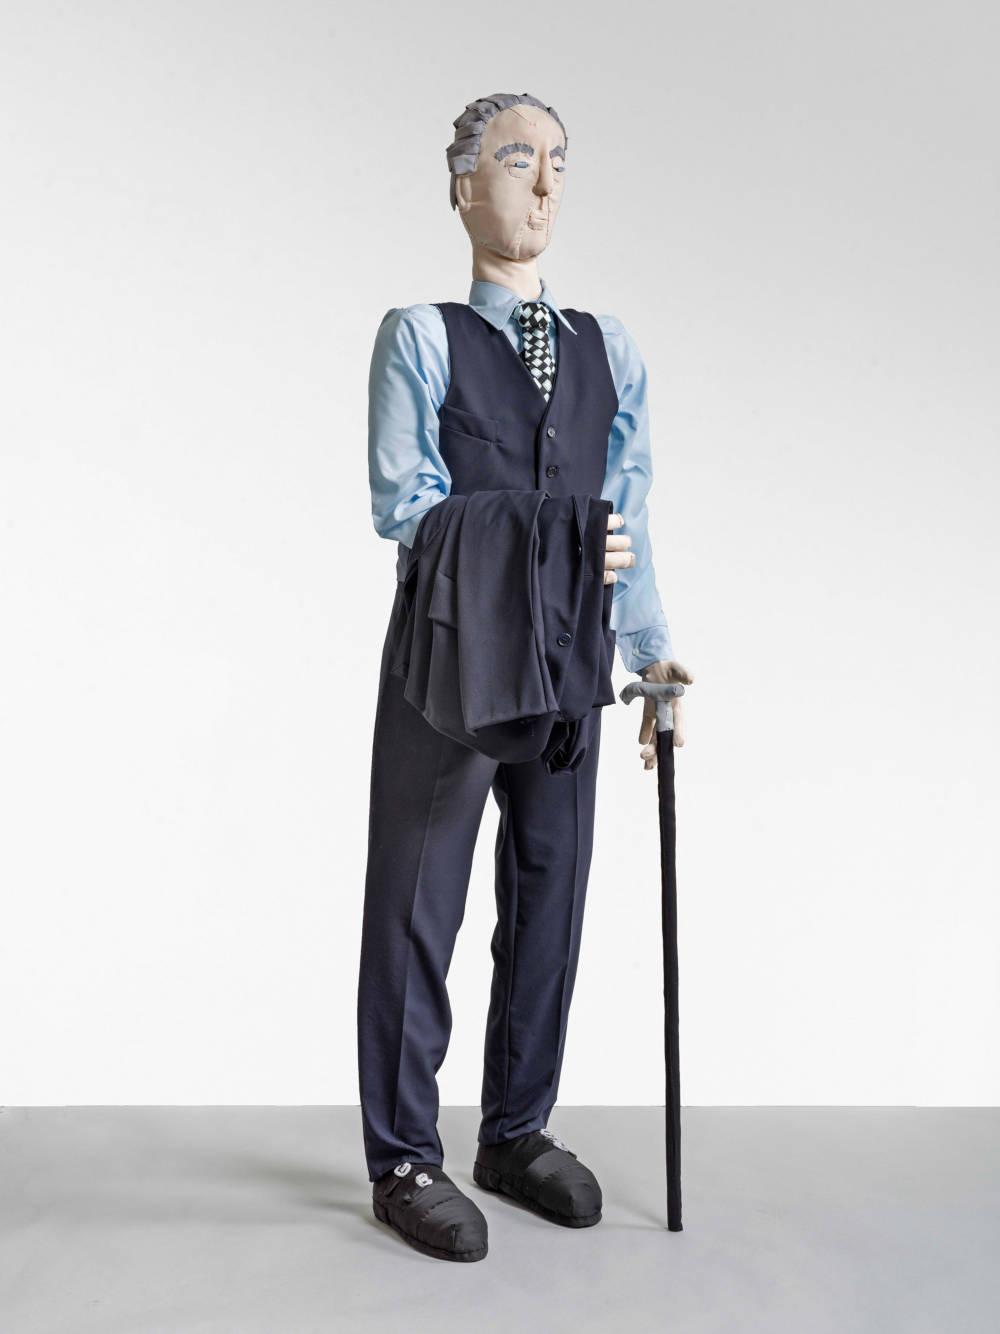 Herr mit Stock (Gentleman with a Cane)